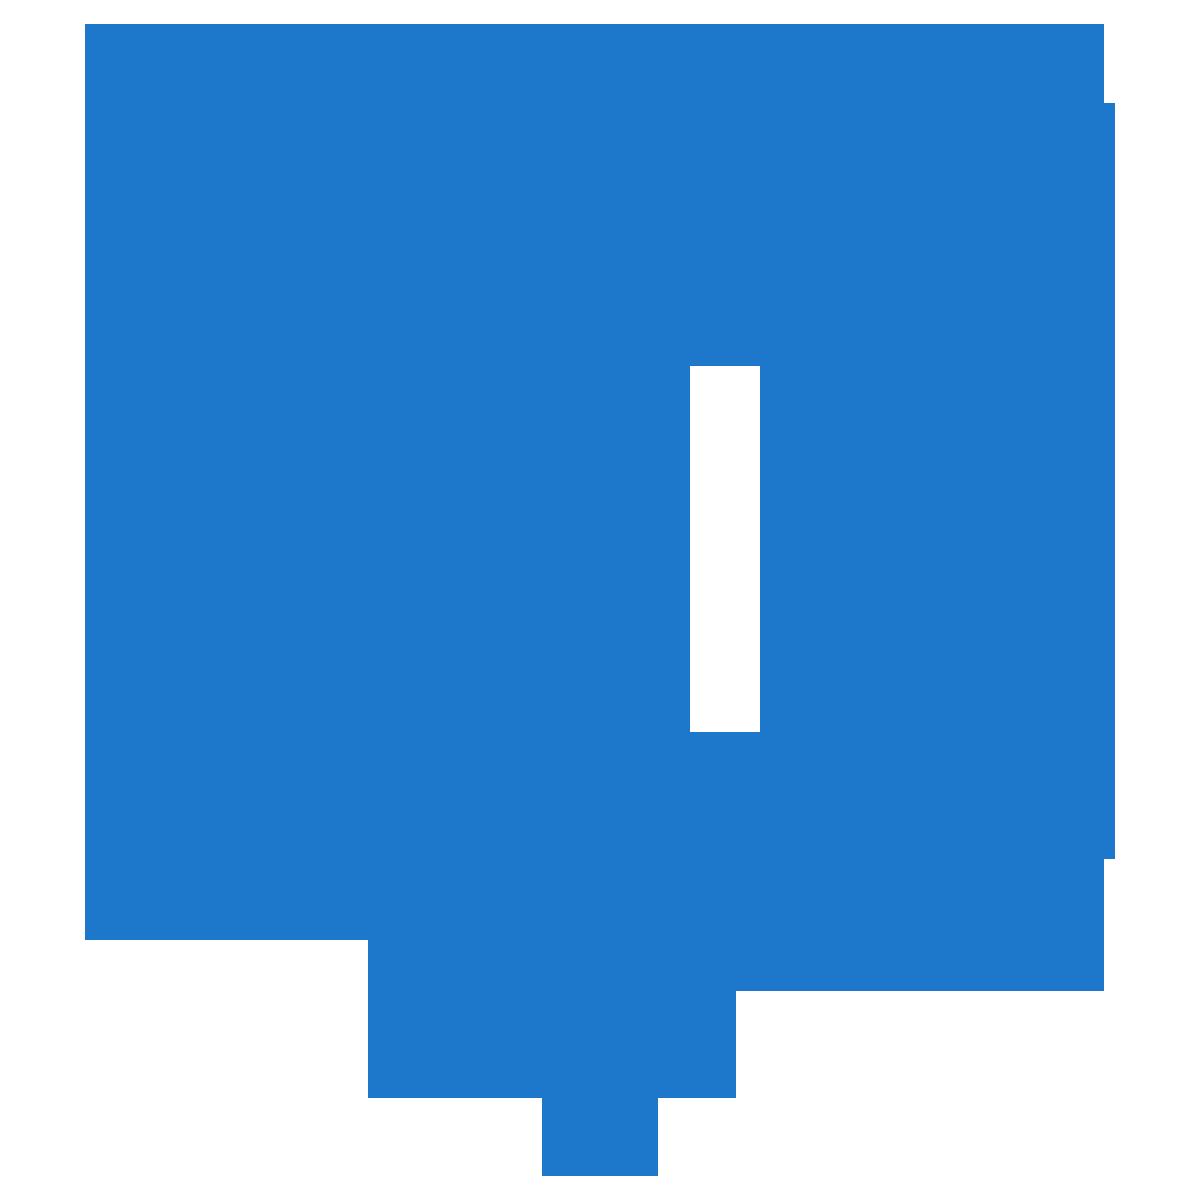 Lockdown clipart graphic download Padlock clipart lockdown, Padlock lockdown Transparent FREE for ... graphic download